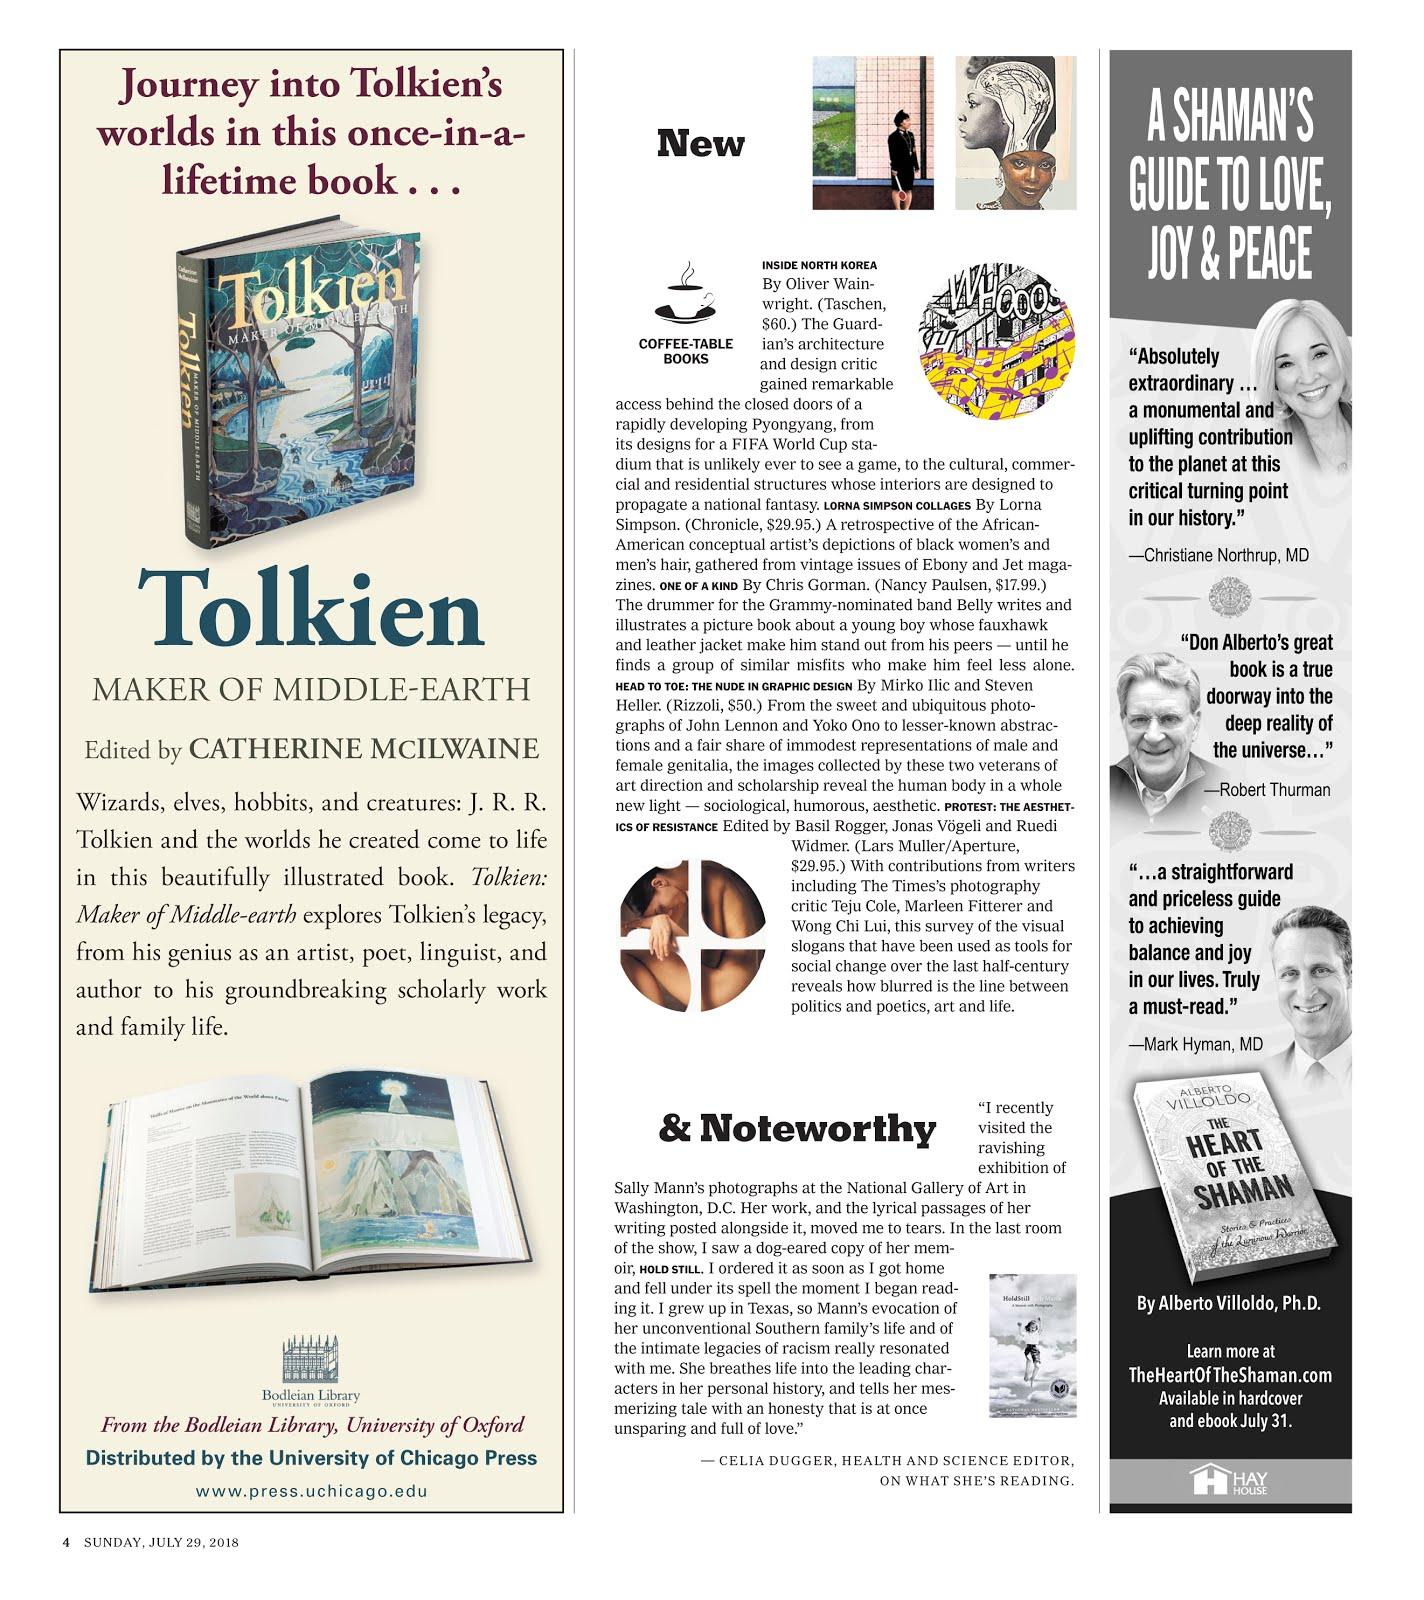 Mirko Ilic Blog New York Times Book Review